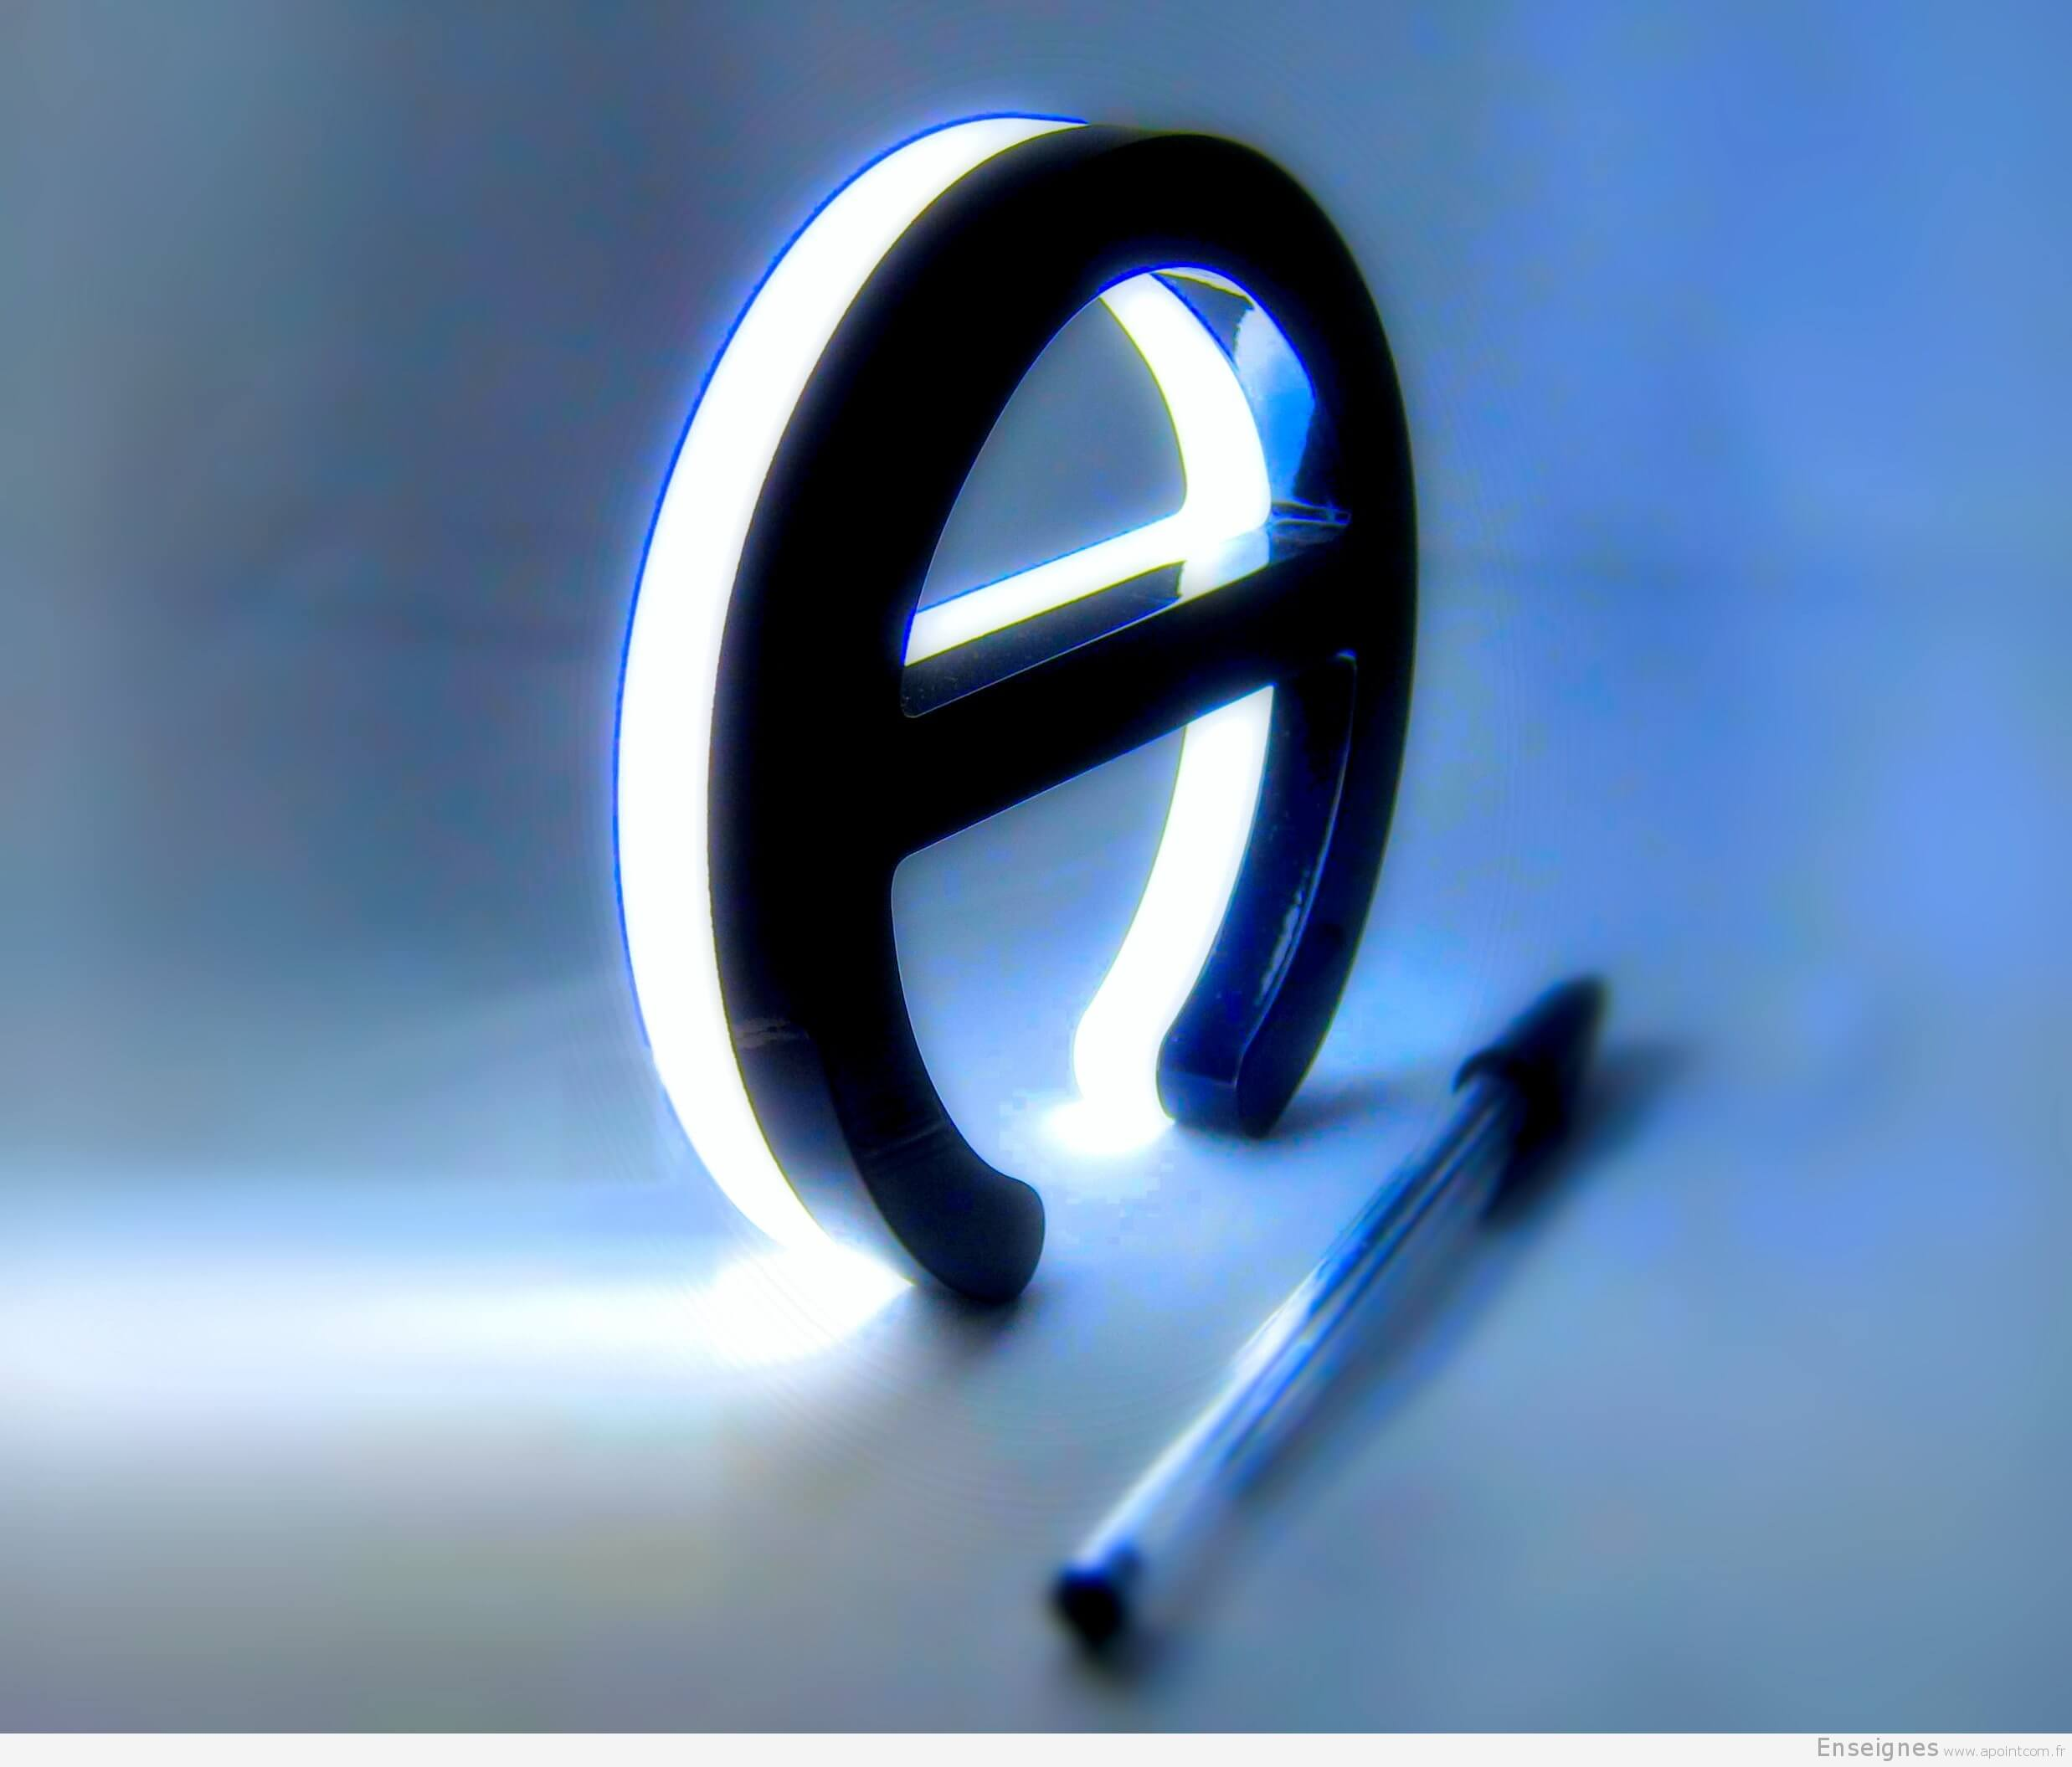 Fabrication lettre relief lumineuse en plexiglas paris - Lettre lumineuse enseigne ...